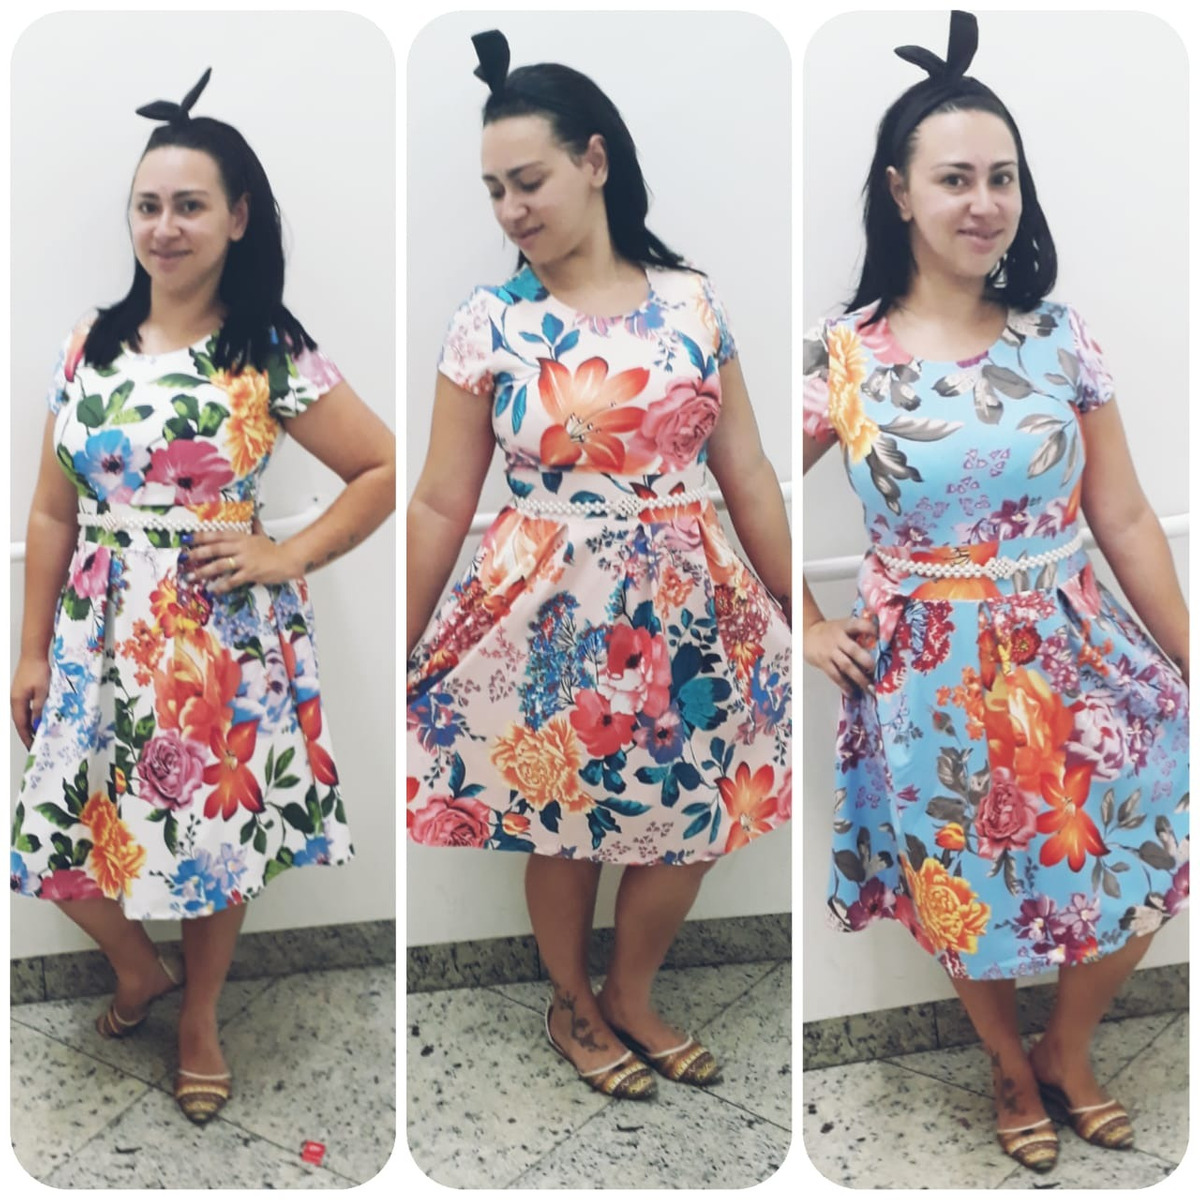 db3f67188 promocao vestido midi verao 2019 tendencia moda evangelica. Carregando zoom.